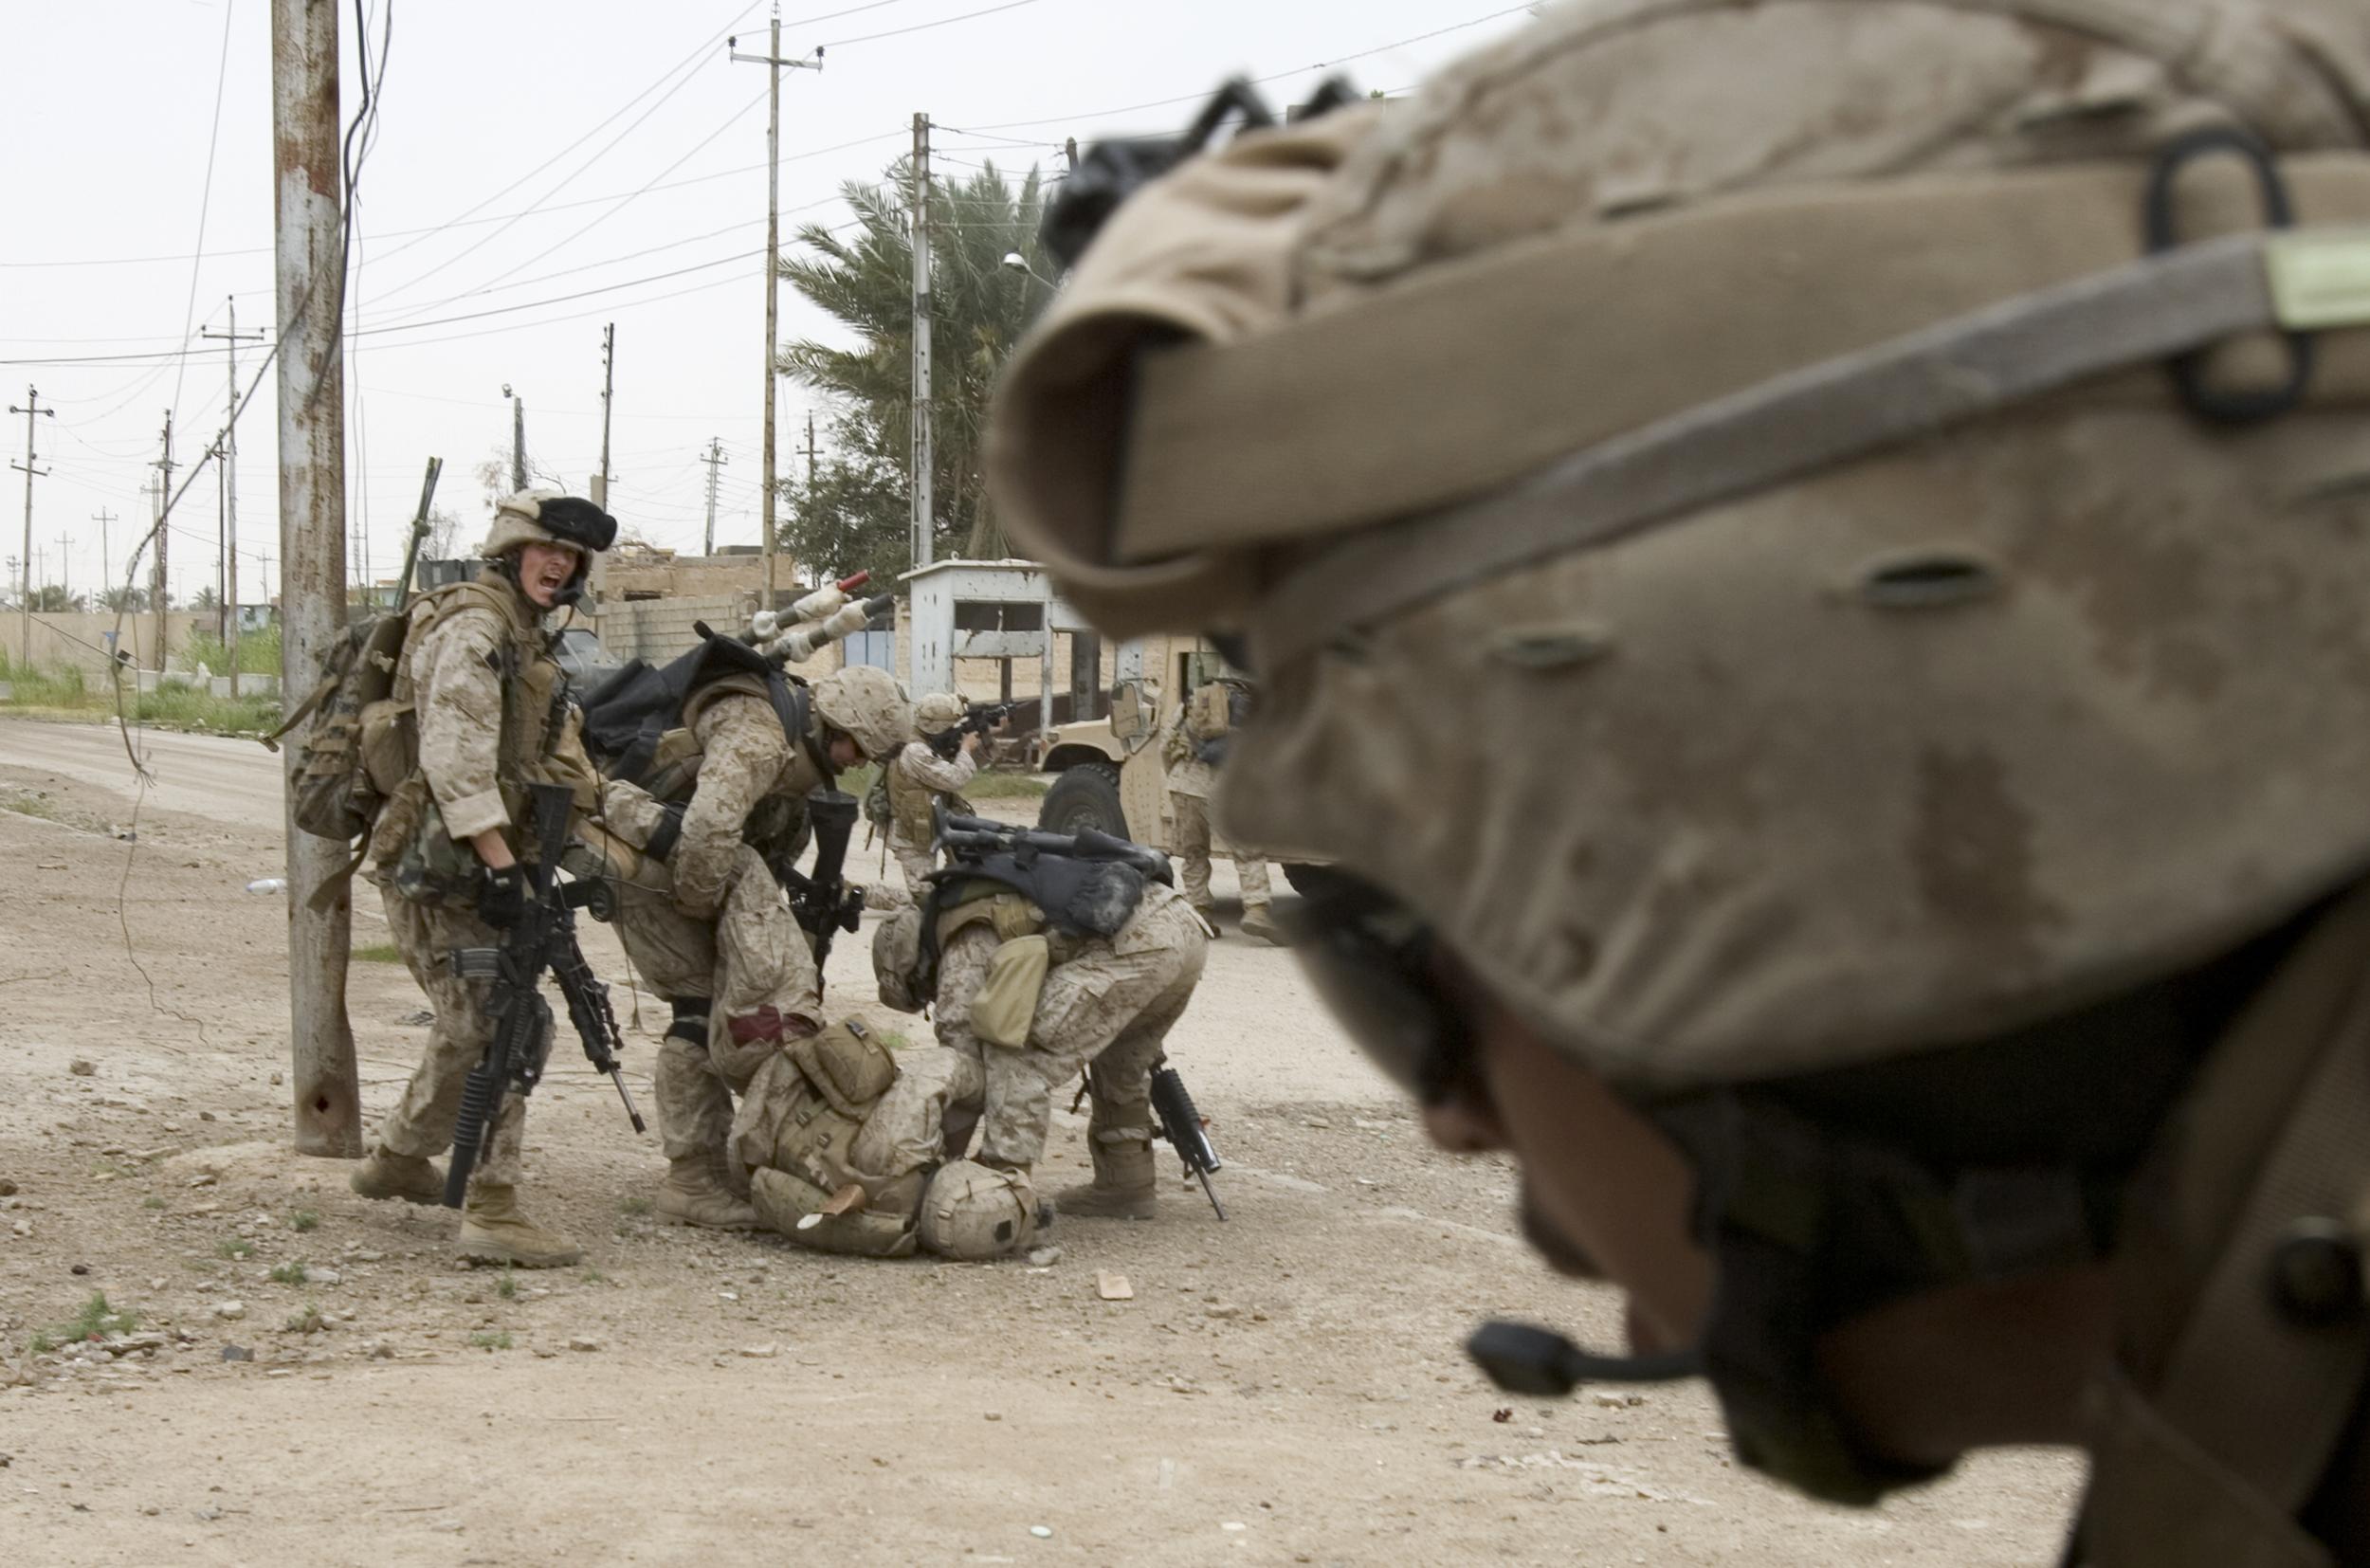 Only The Dead 15 - Credit Yuri Kosyrev _ Noor Images_U.S. Troops under fire in Ramadi.jpg